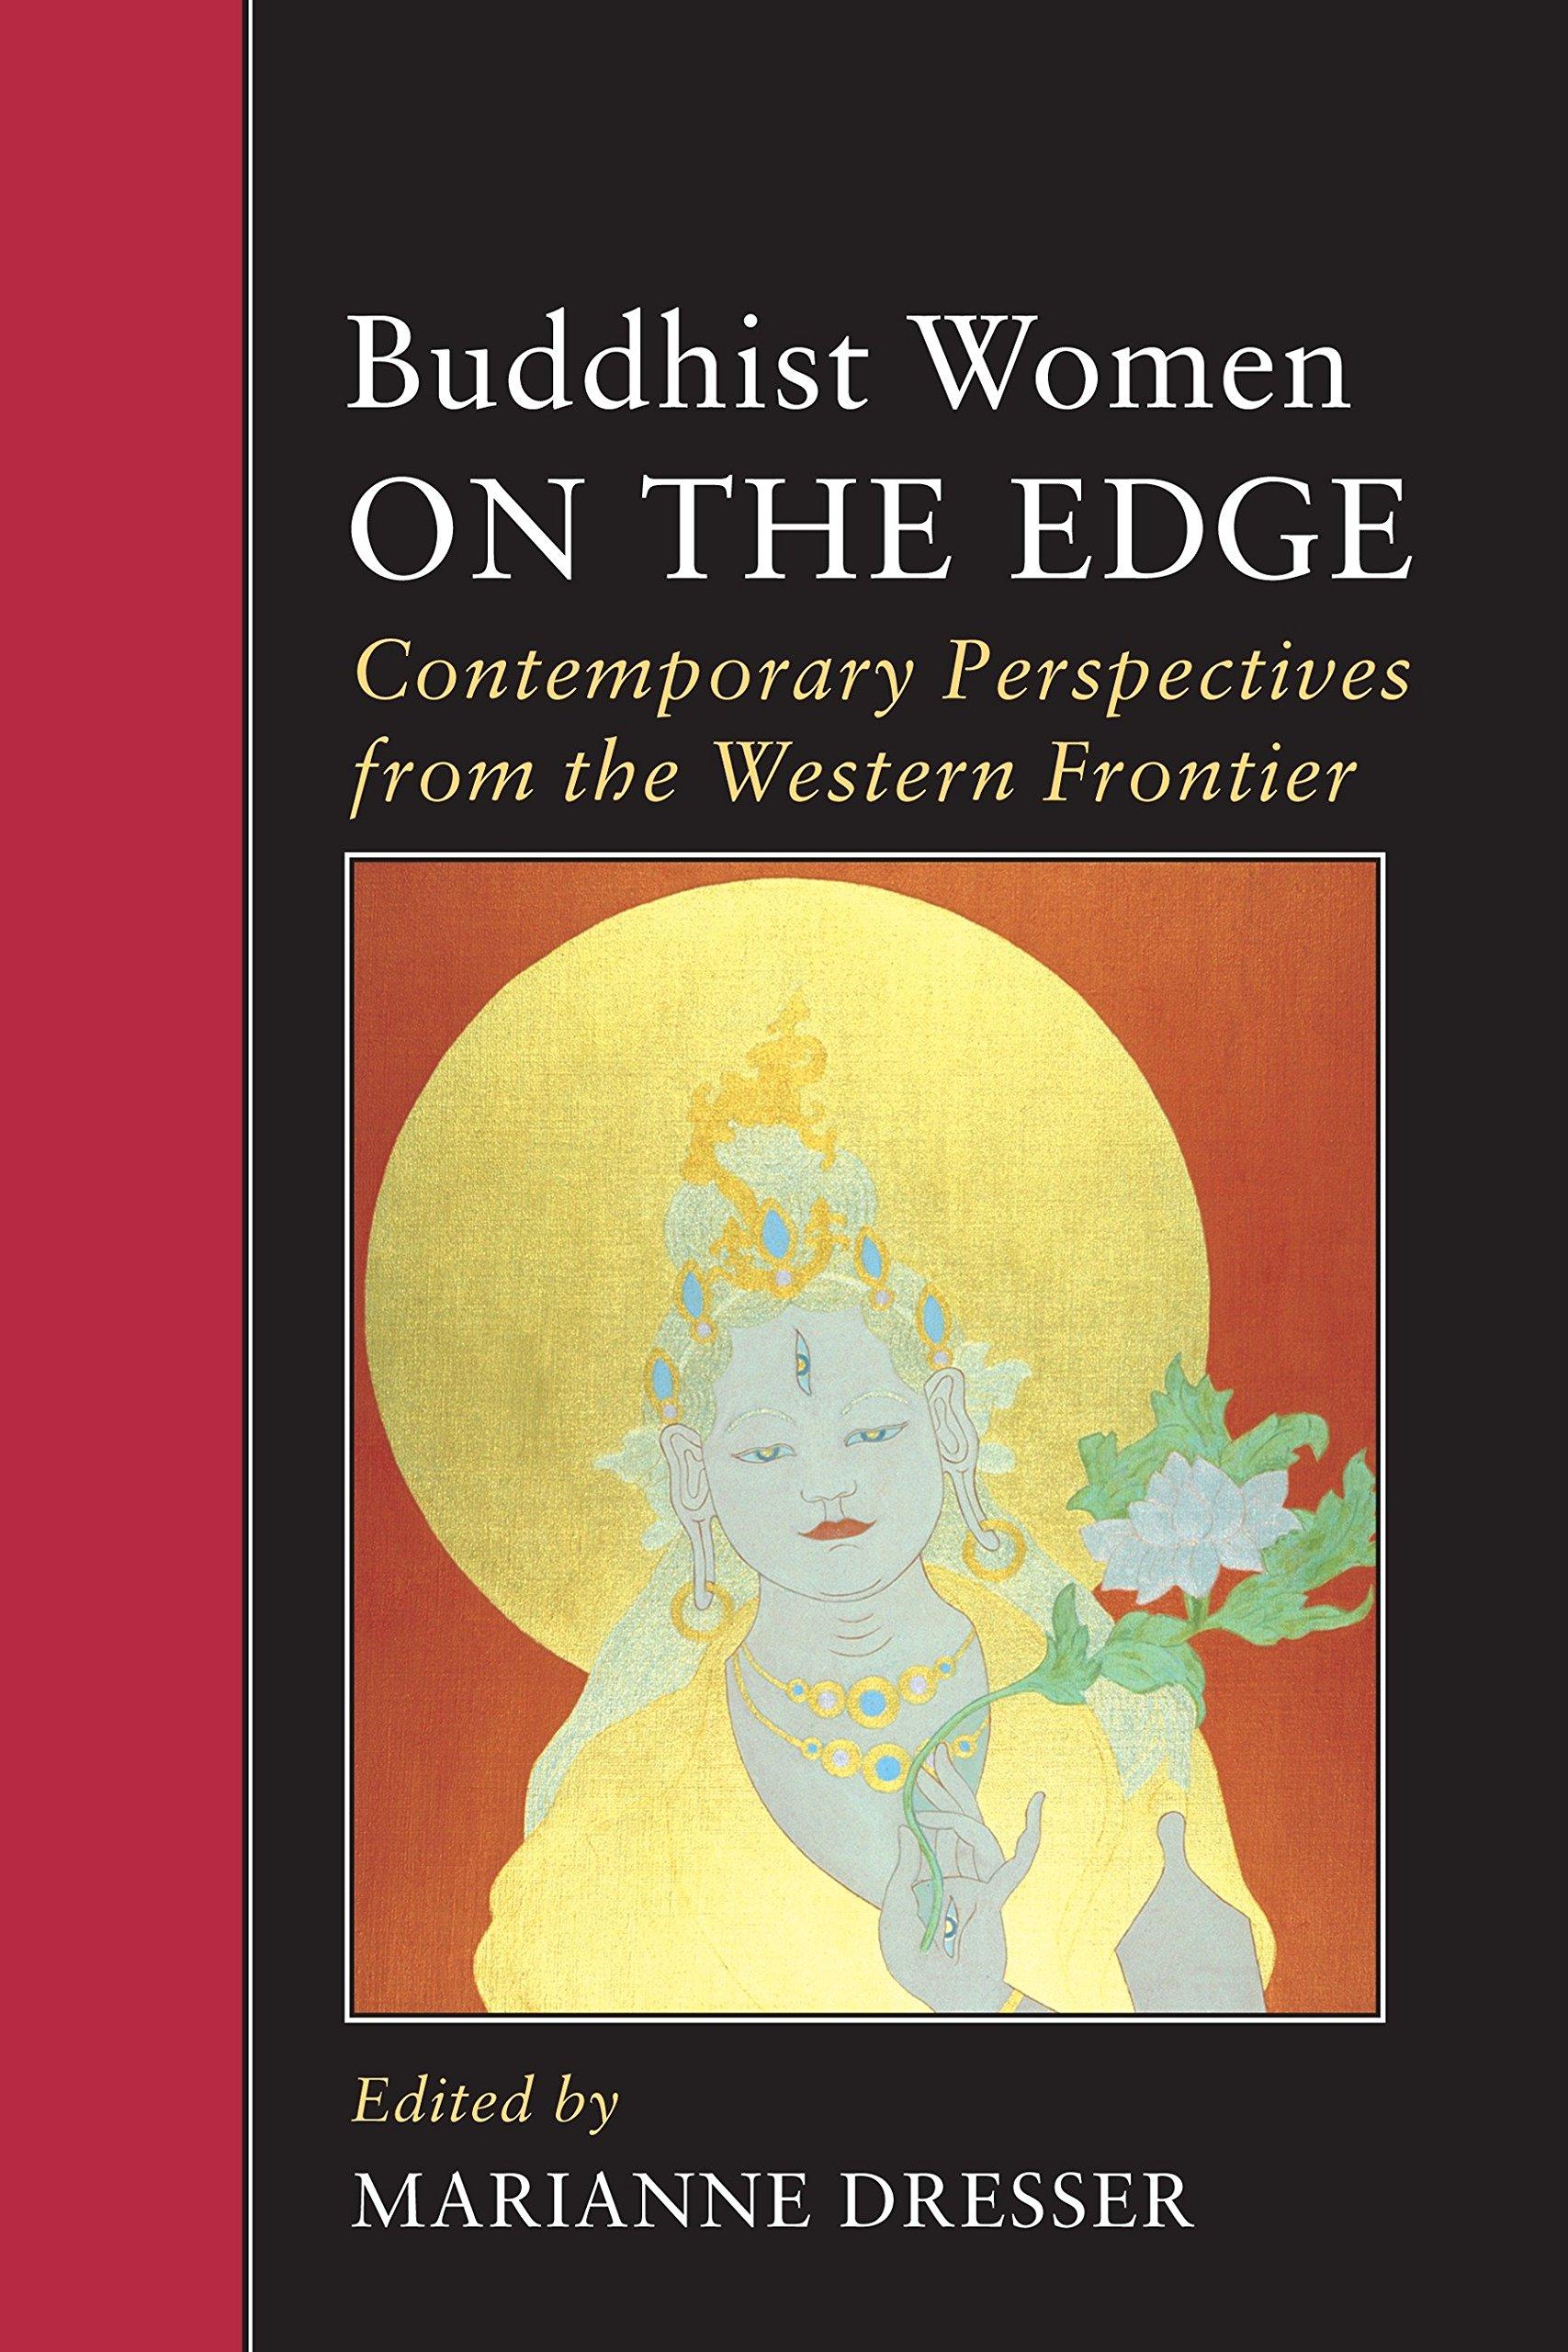 Buddhist Women on the Edge cover art